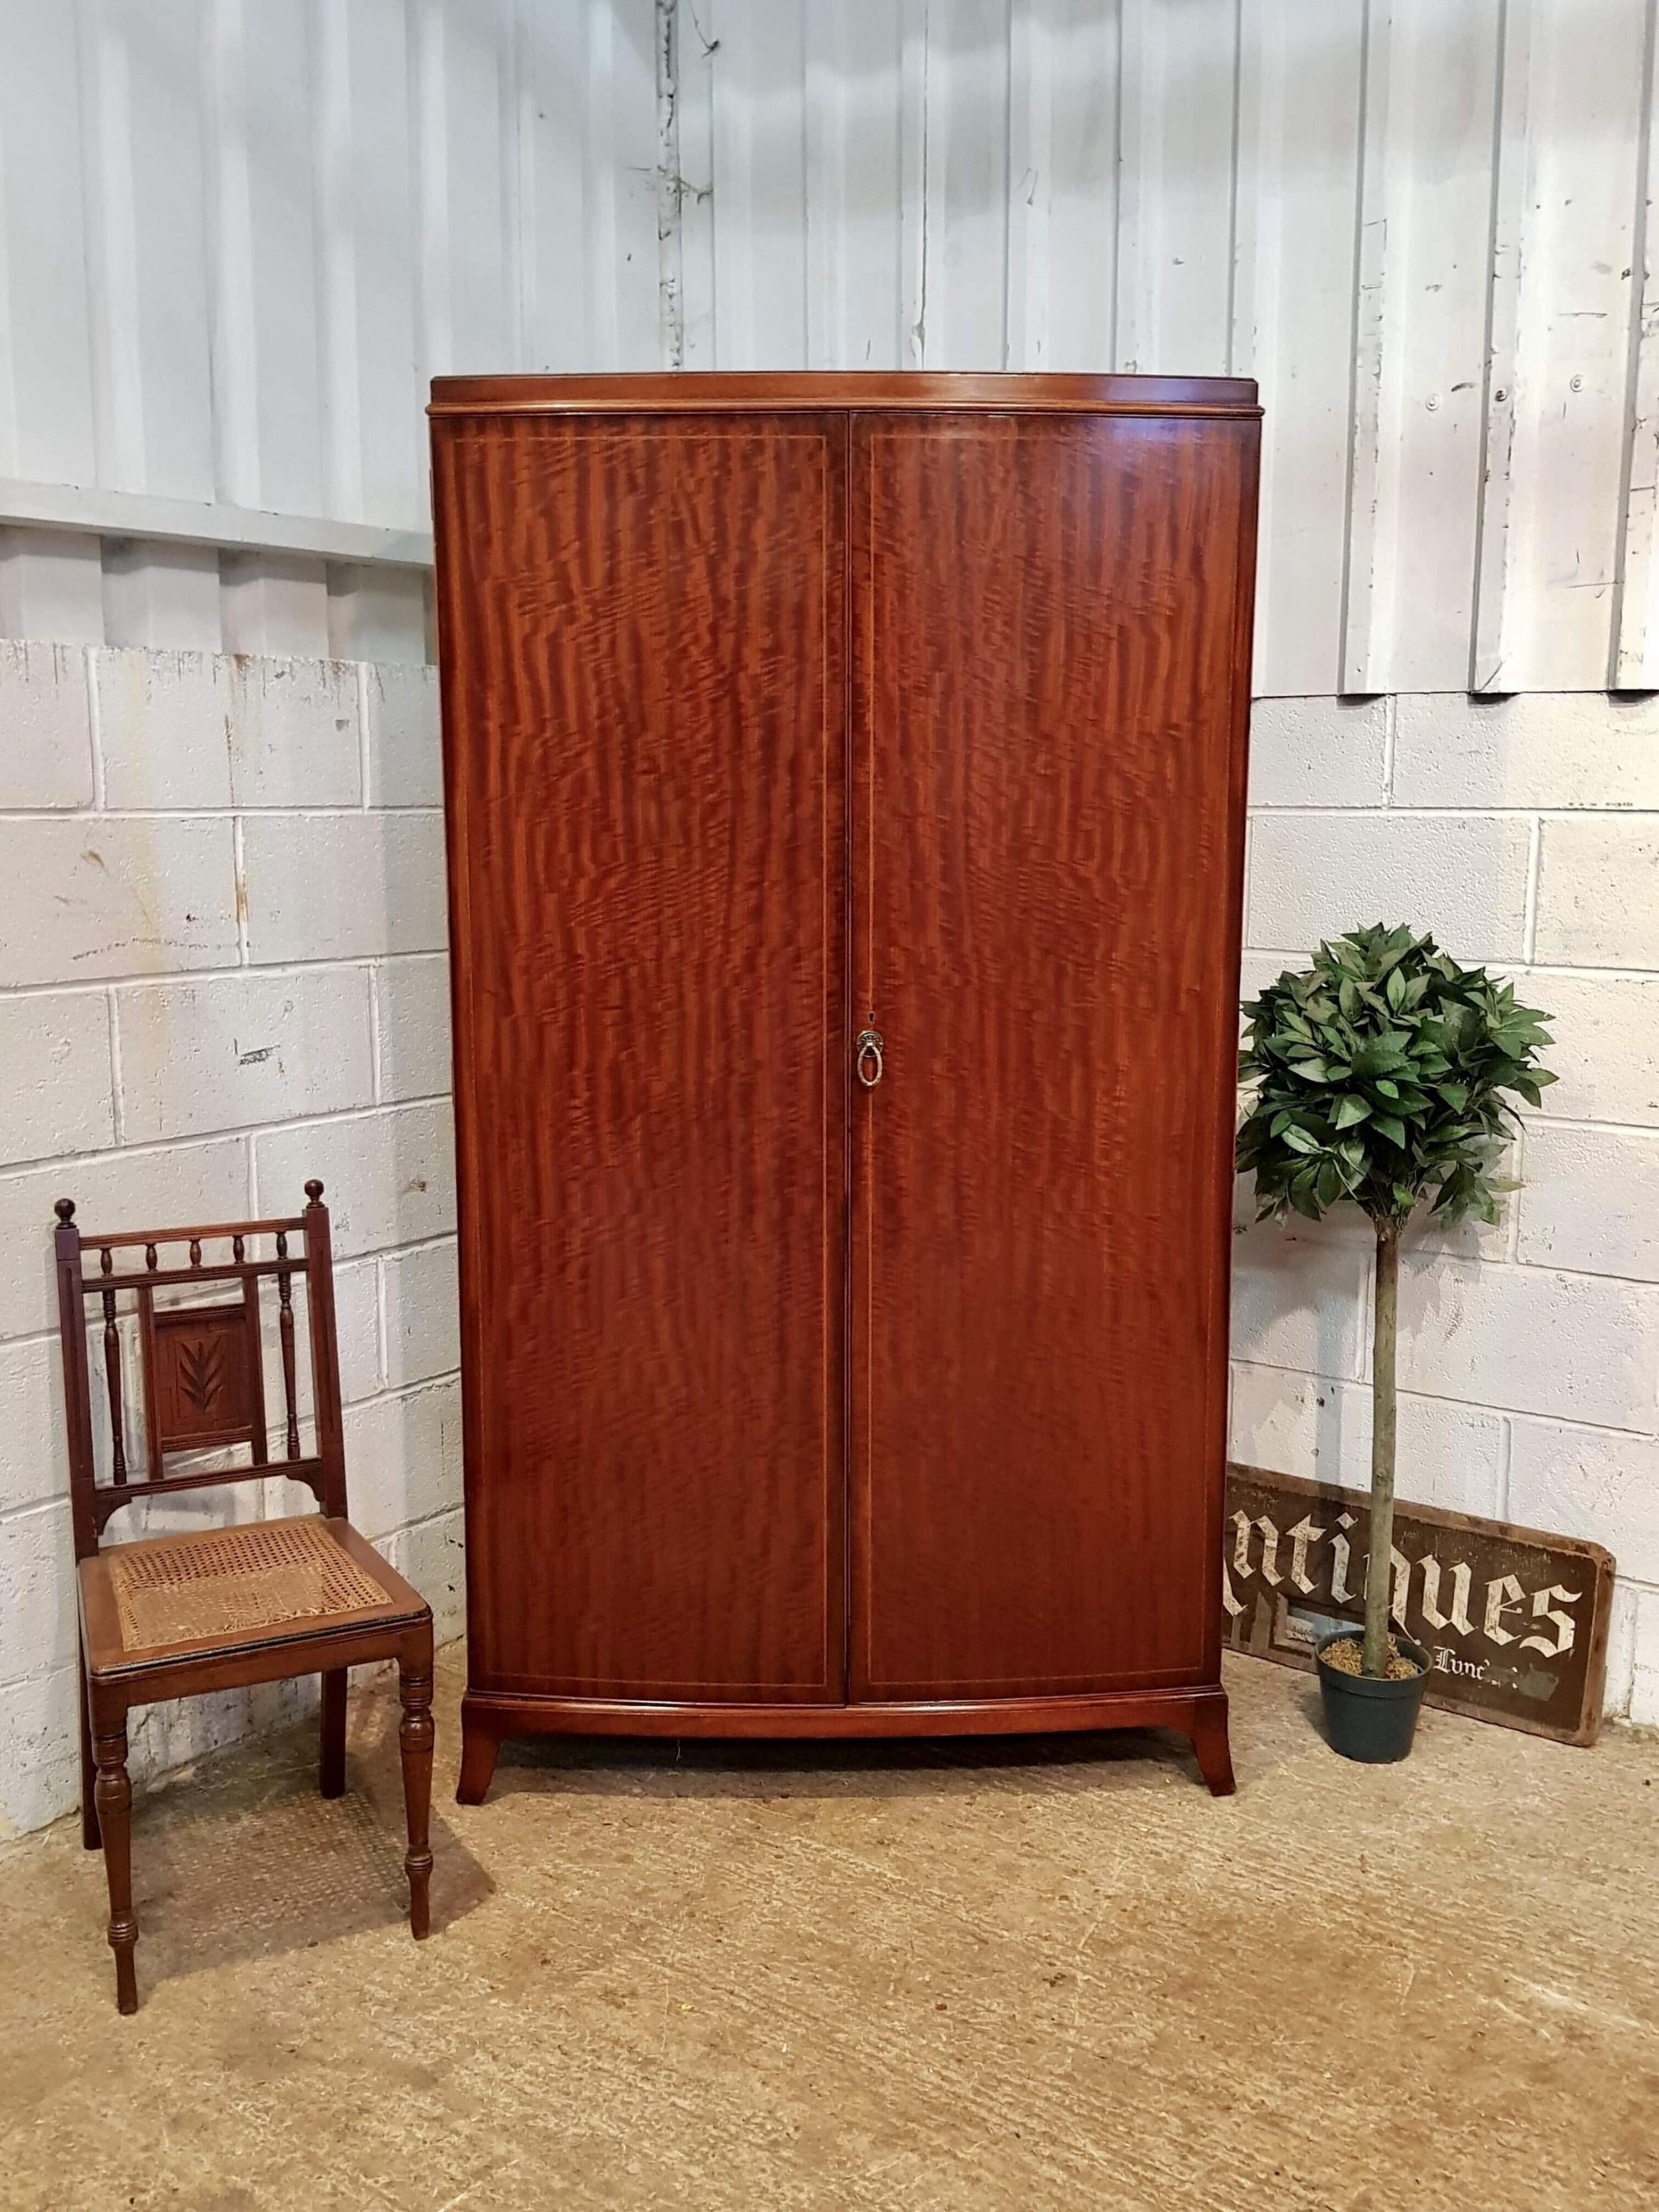 antique bow front figured mahogany double wardrobe c1920